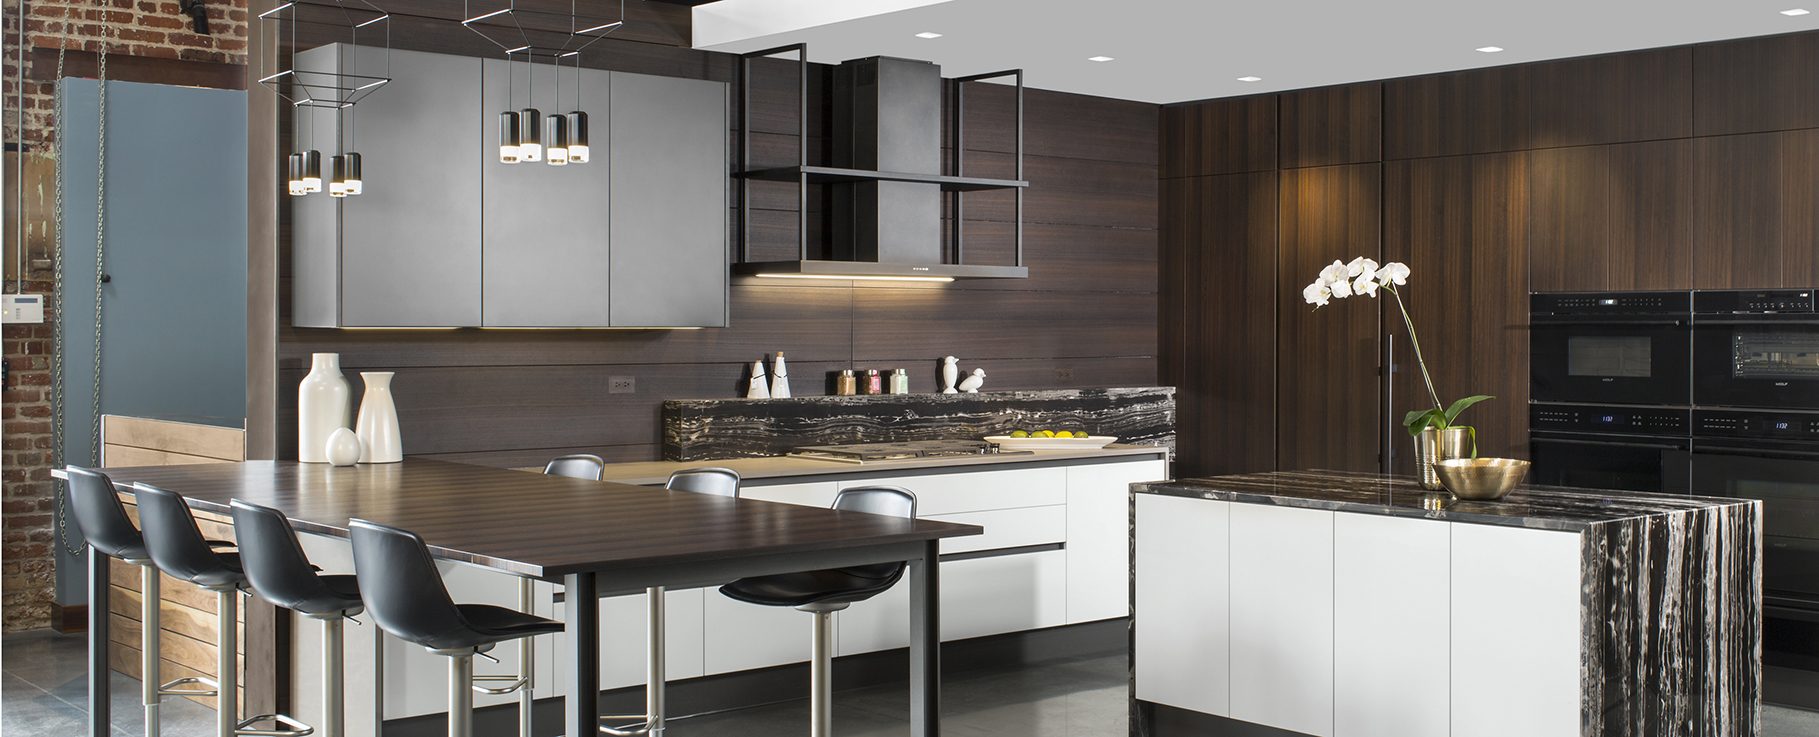 Exquisite Kitchen Design - 601 S. Broadway, Suite F, Denver ...